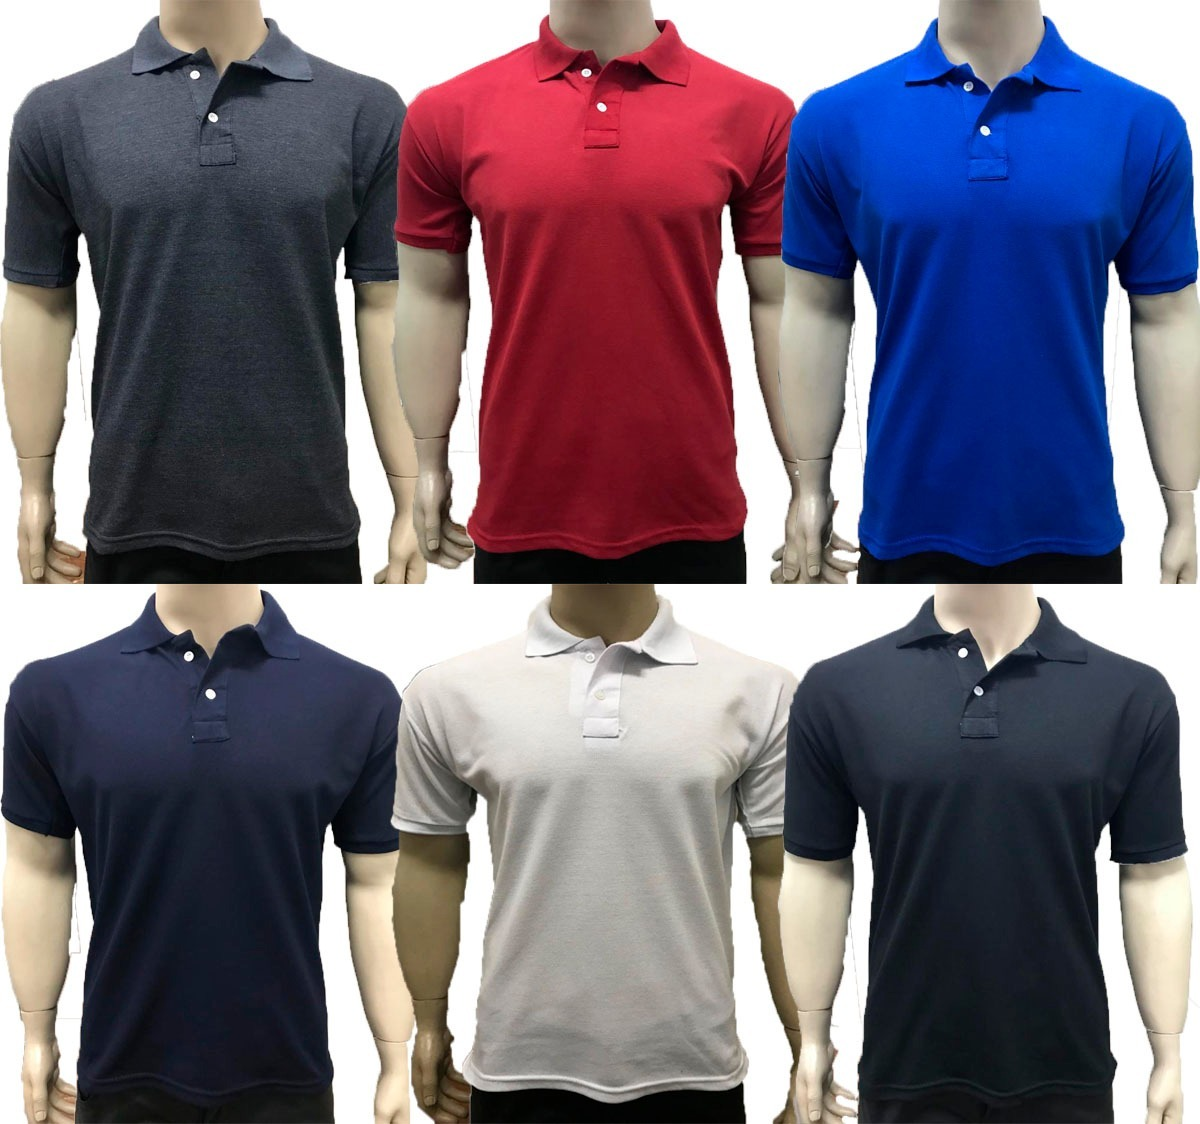 Kit 06 Camisas Camisetas Revenda Gola Polo Masculina Atacado - R ... 9ffd9b8cf7